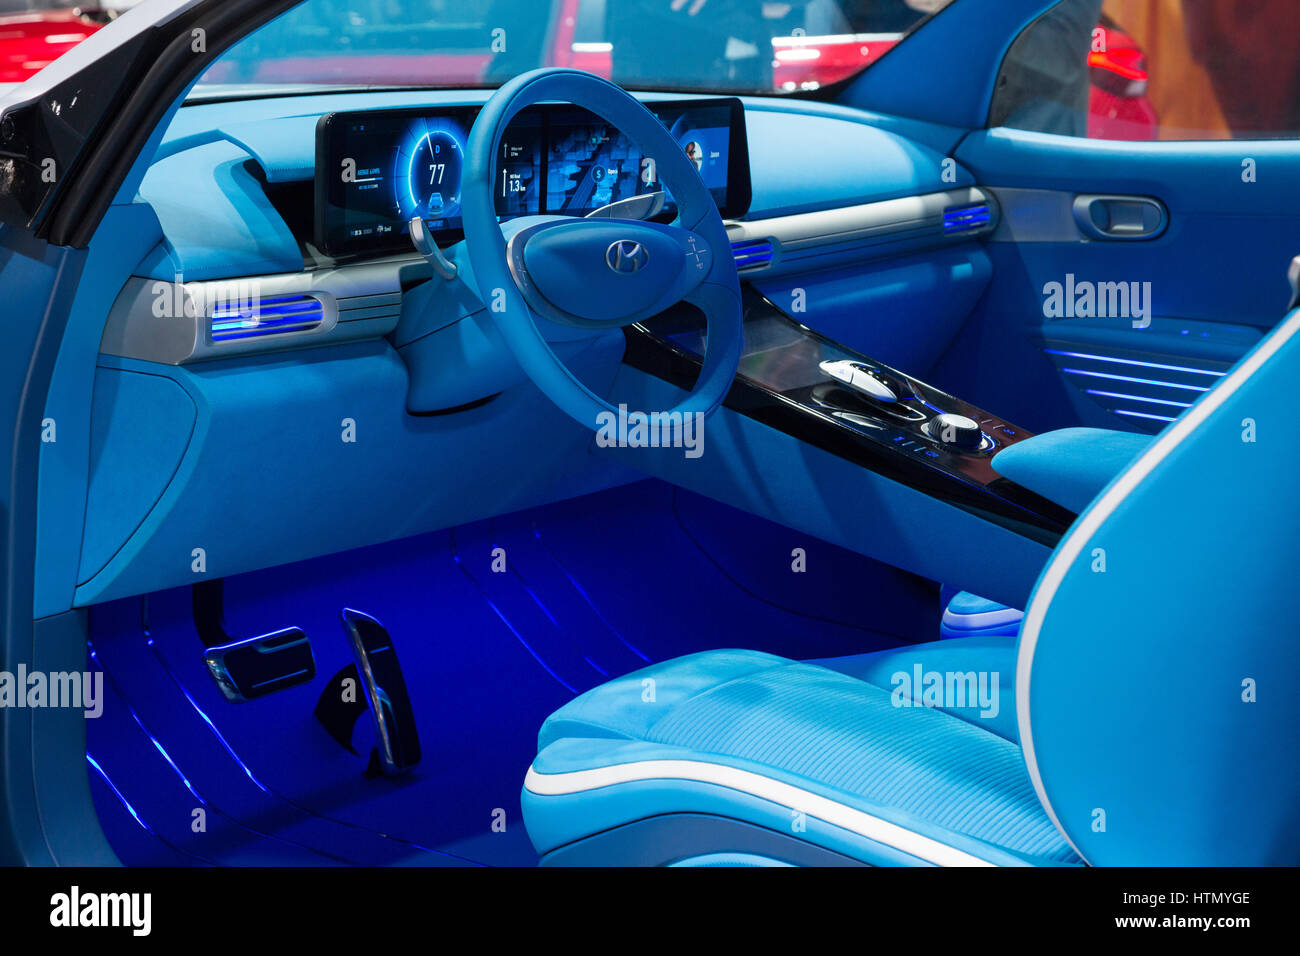 Hyundai FE Fuel Cell Concept at the 87th International Geneva Motor Show - Stock Image